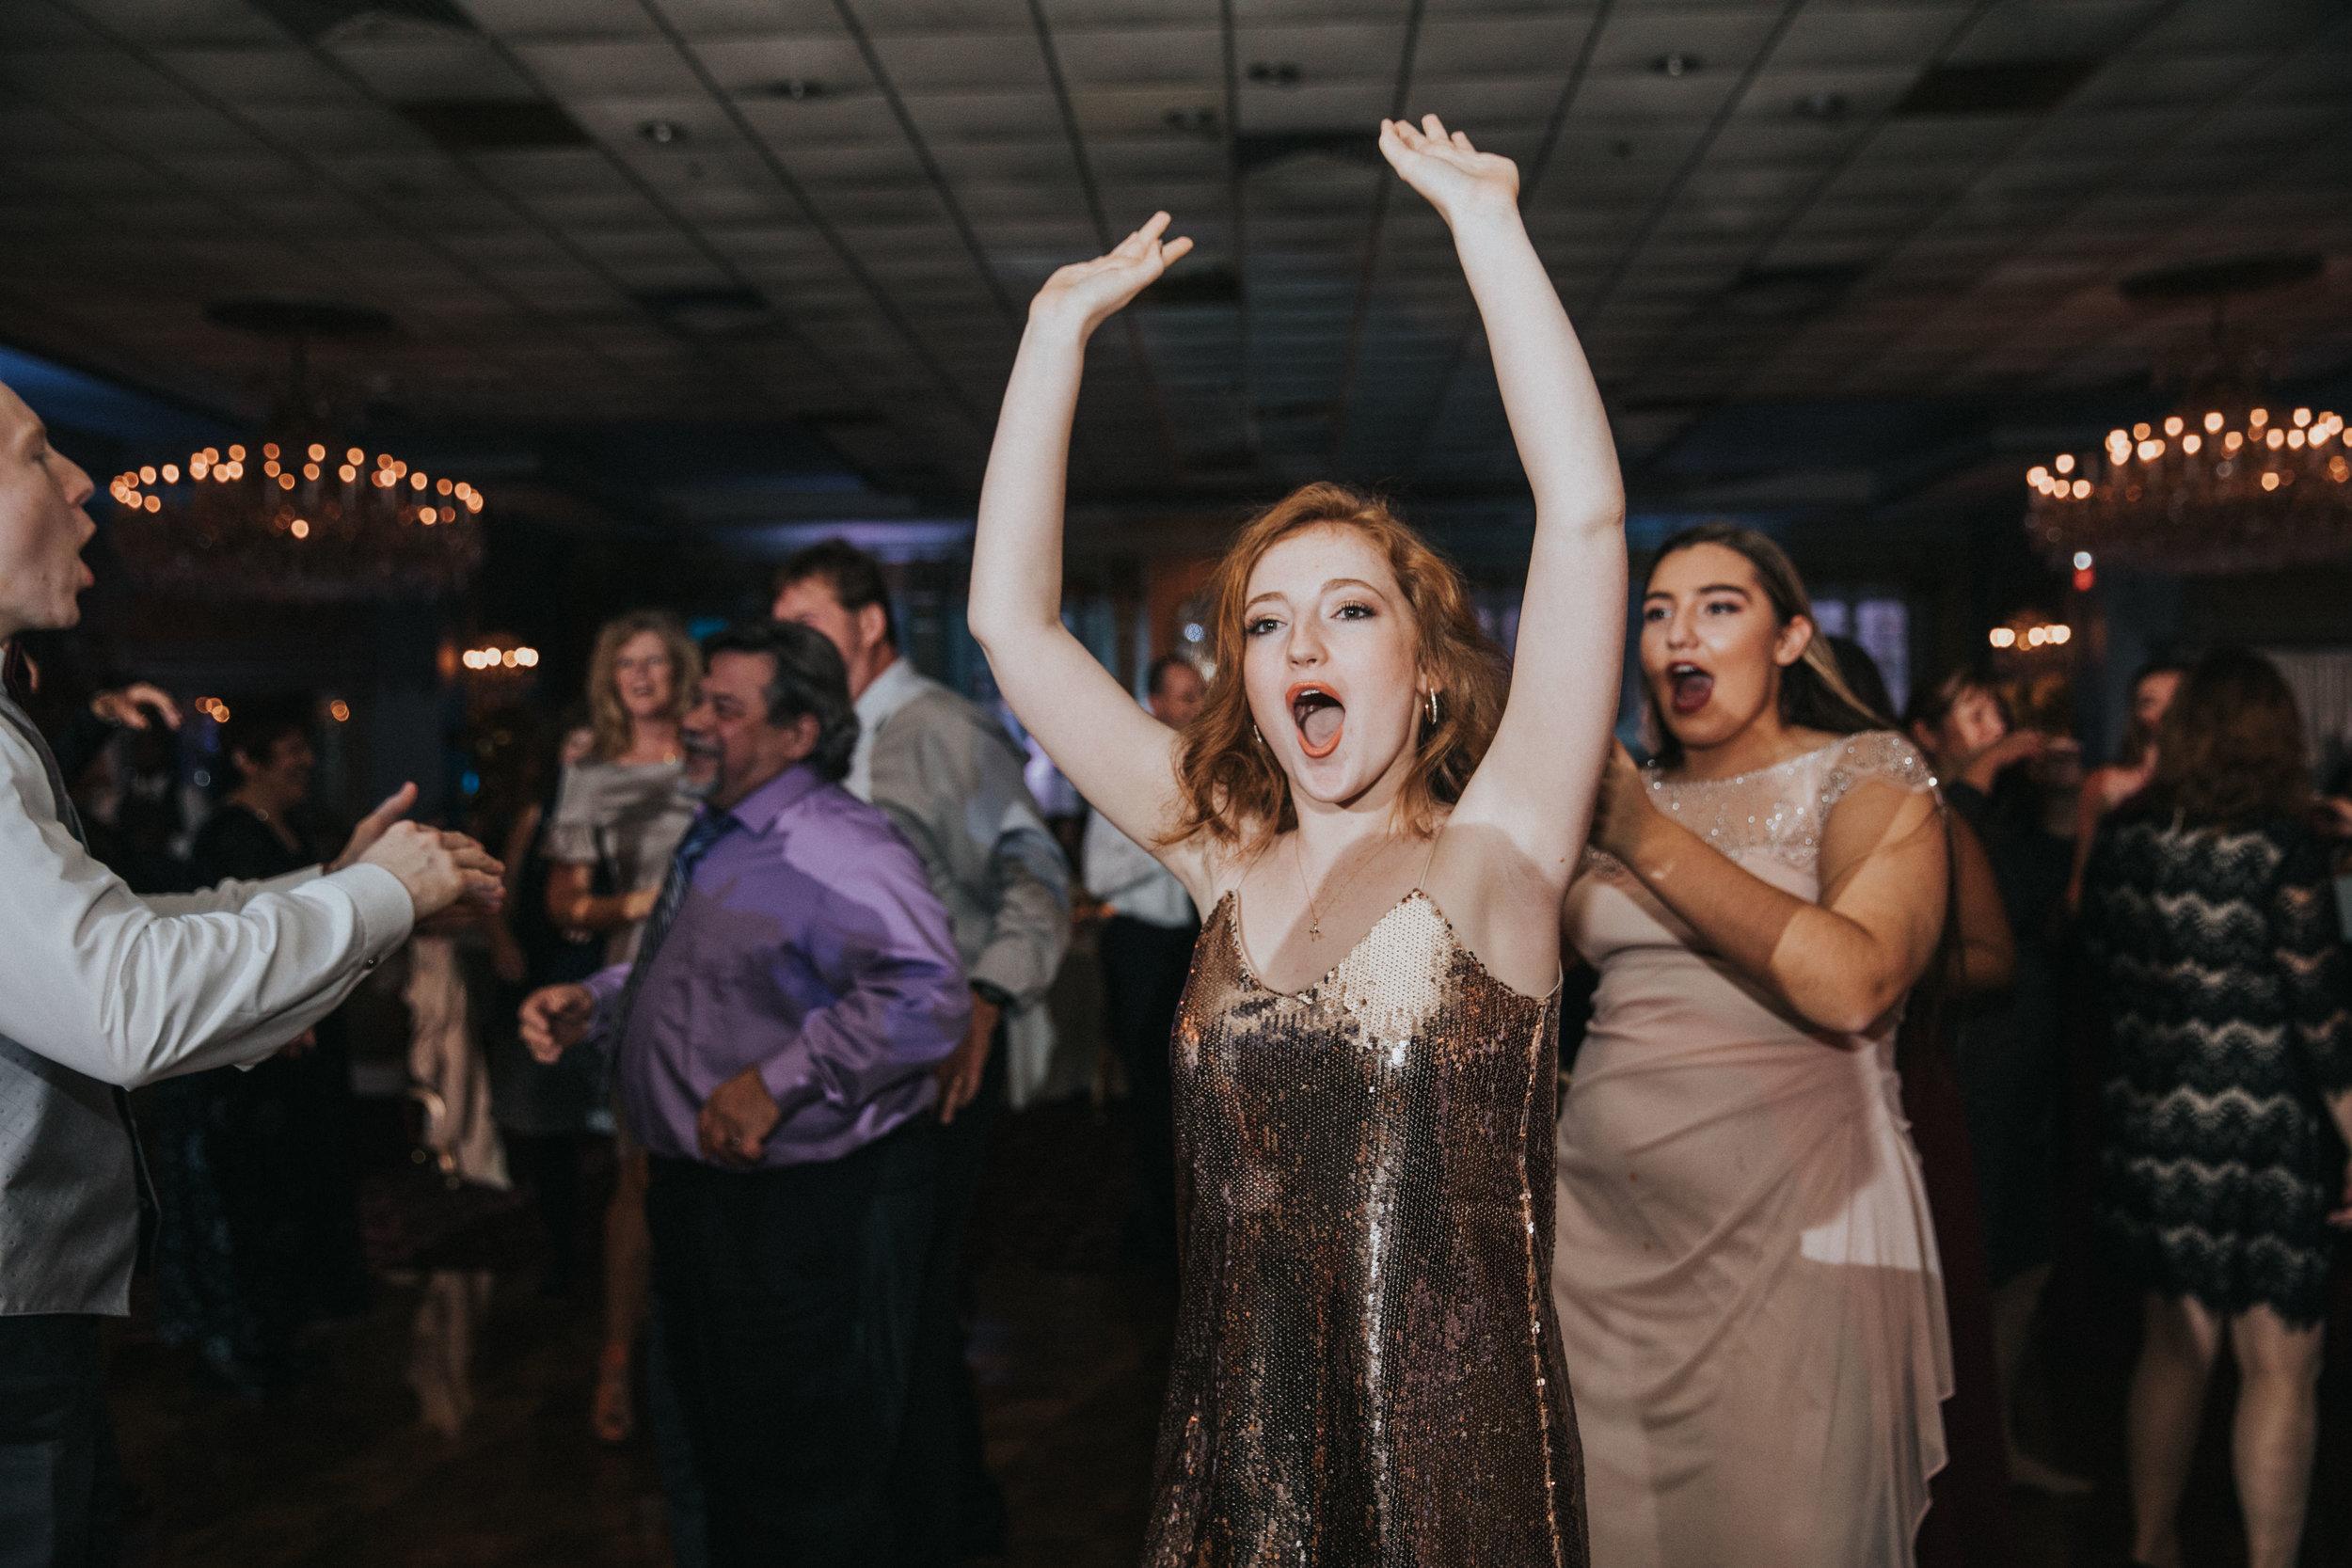 New-Jersey-Wedding-Photography-Fishers-Tudor-House-JennaLynnPhotography-Reception-Kathleen&Eddie-210.jpg